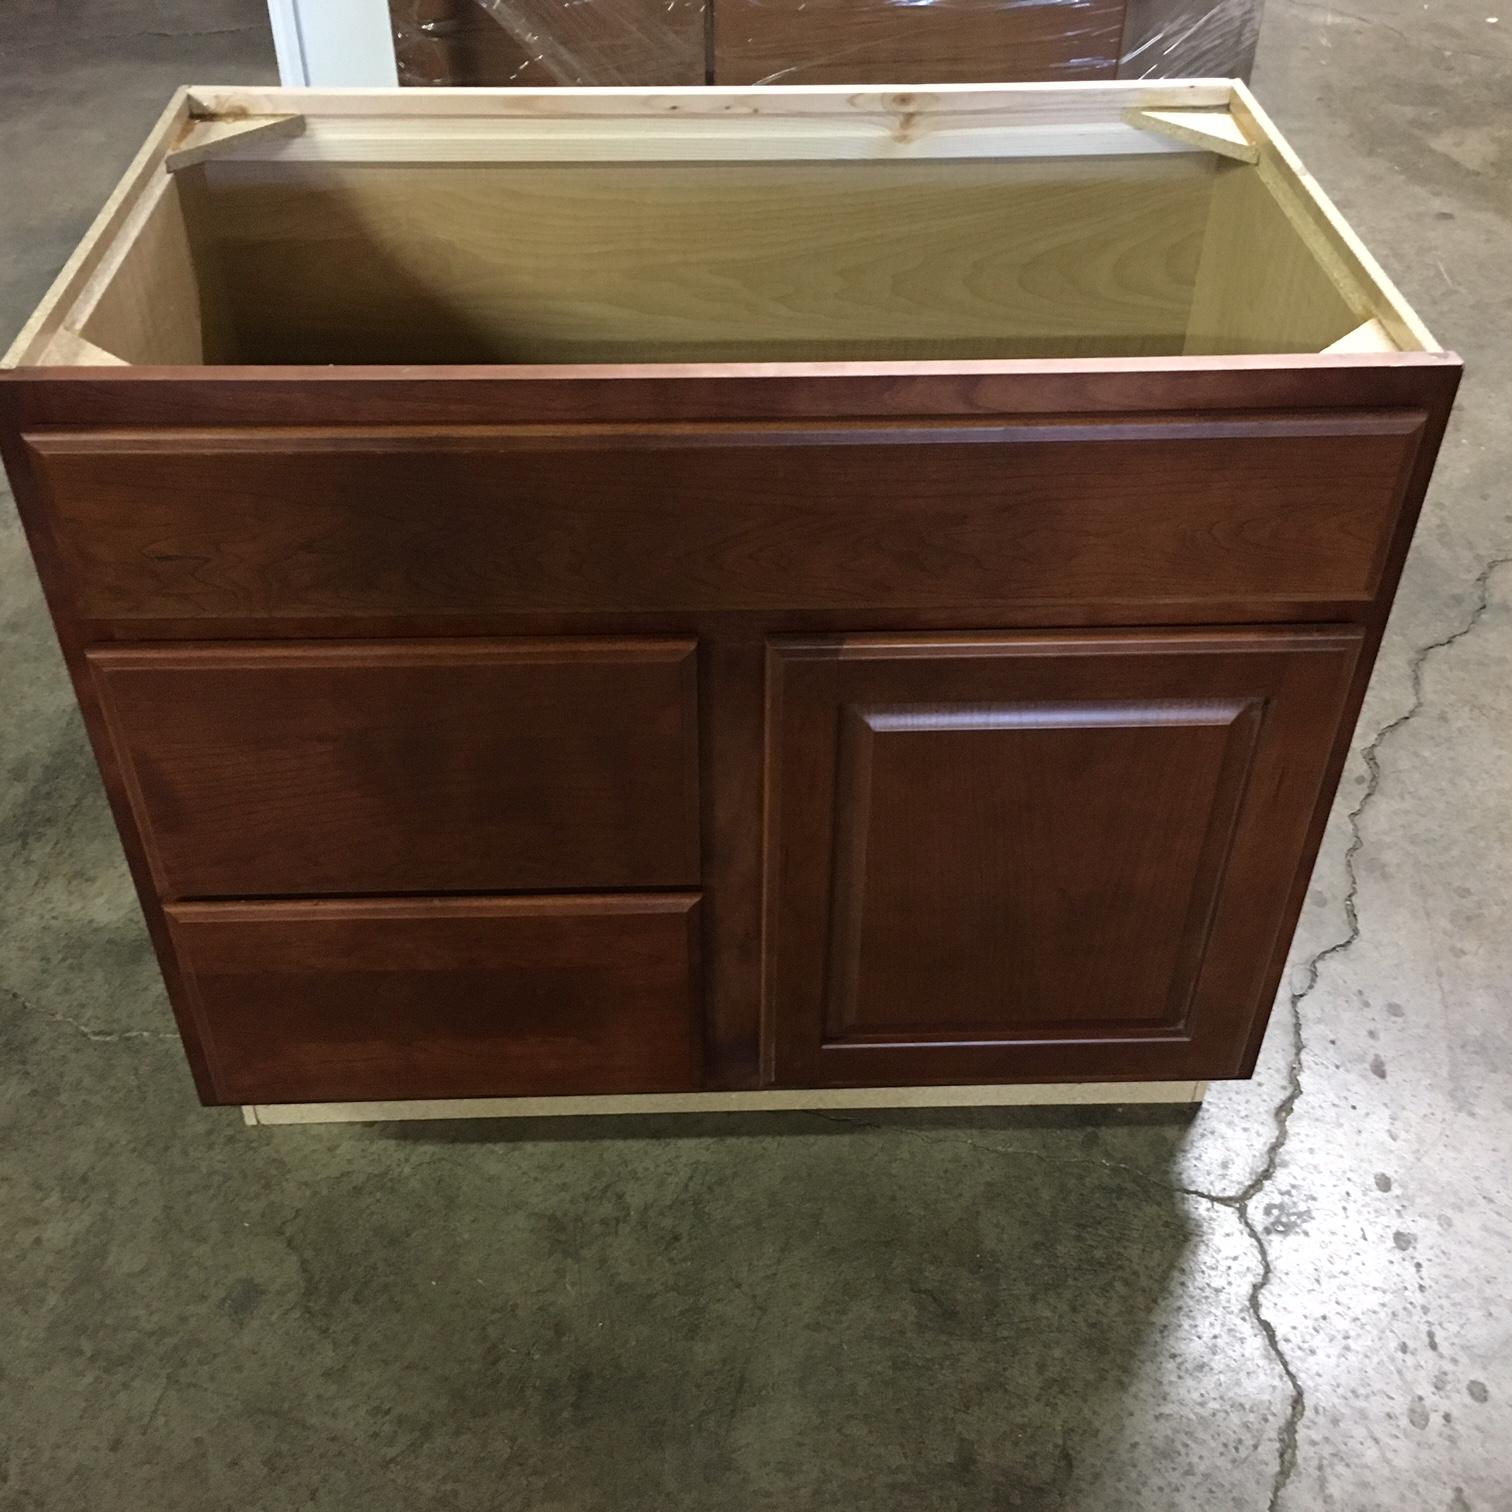 Kitchen Cabinets Cost Per Linear Foot: Merillat Seneca Ridge Oak Cabinets